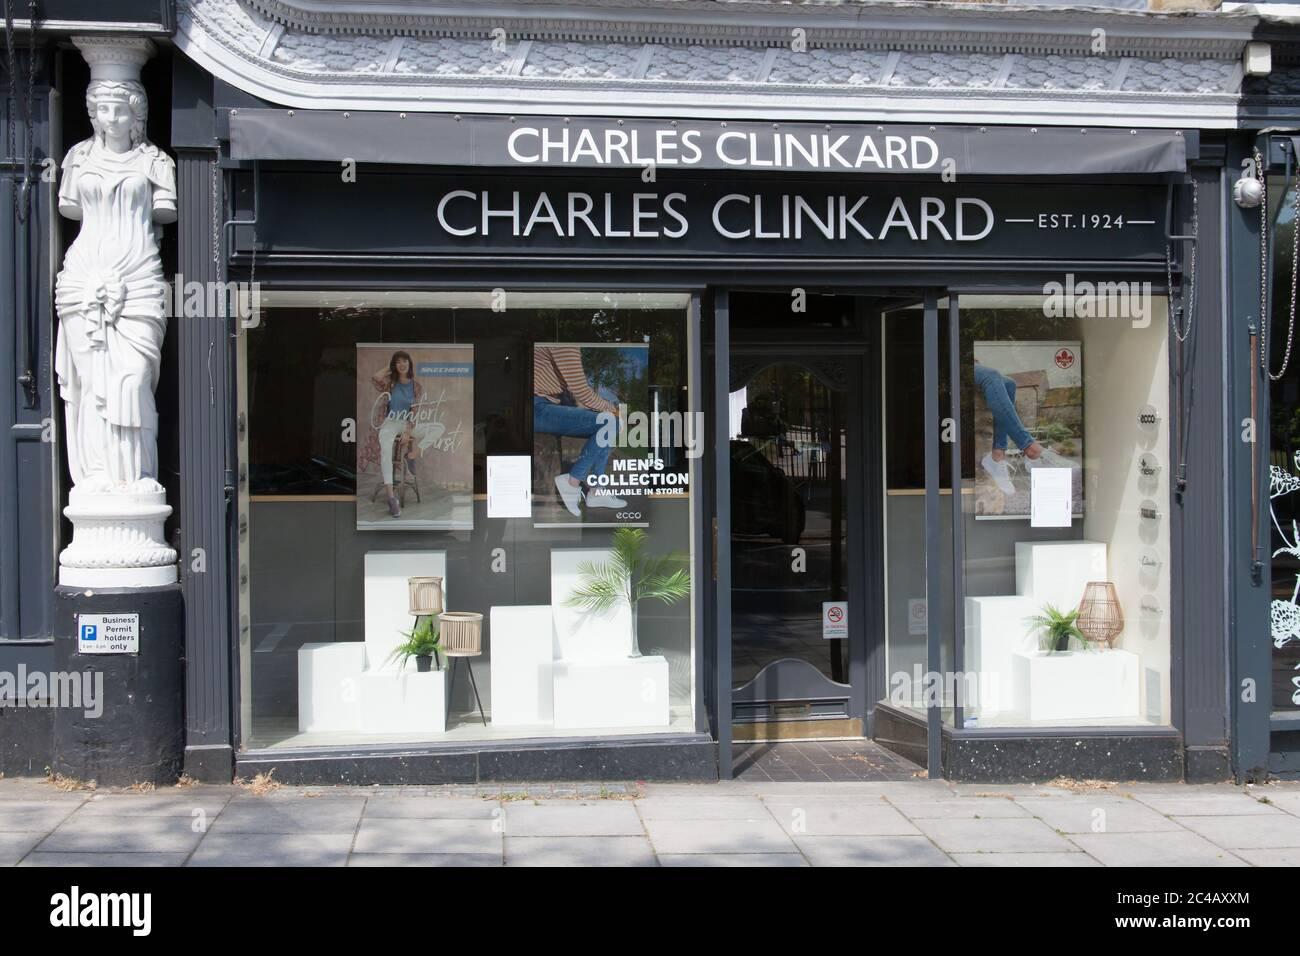 Charles Clinkard Shoe Shop in